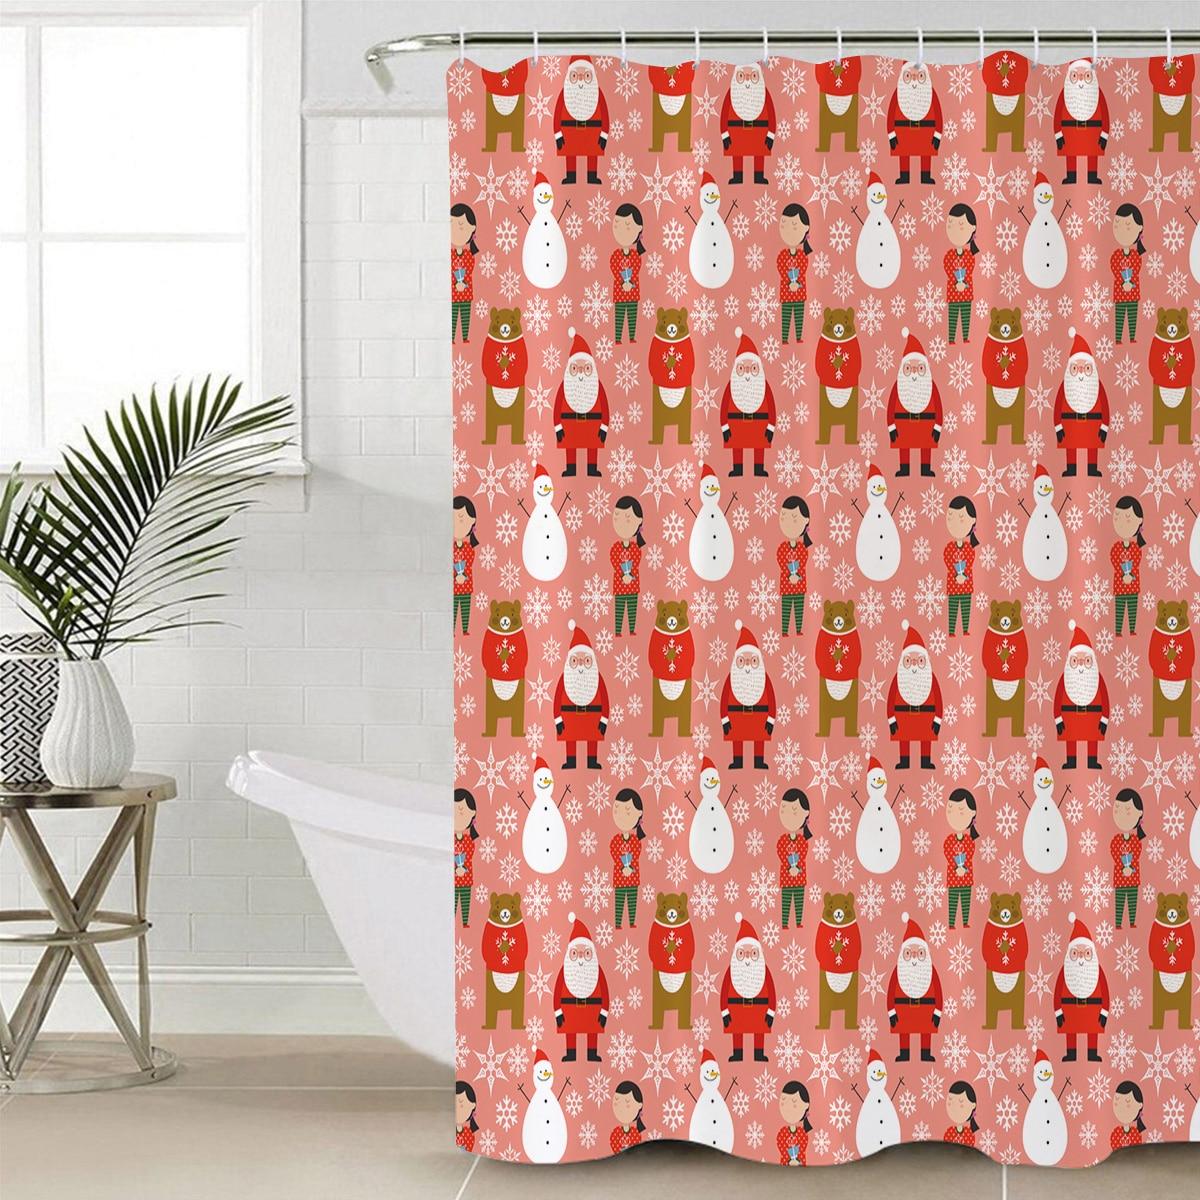 Xmas Puppies Pugs Santa/'s Red Cap Bathroom Polyester Fabric Shower Curtain Set